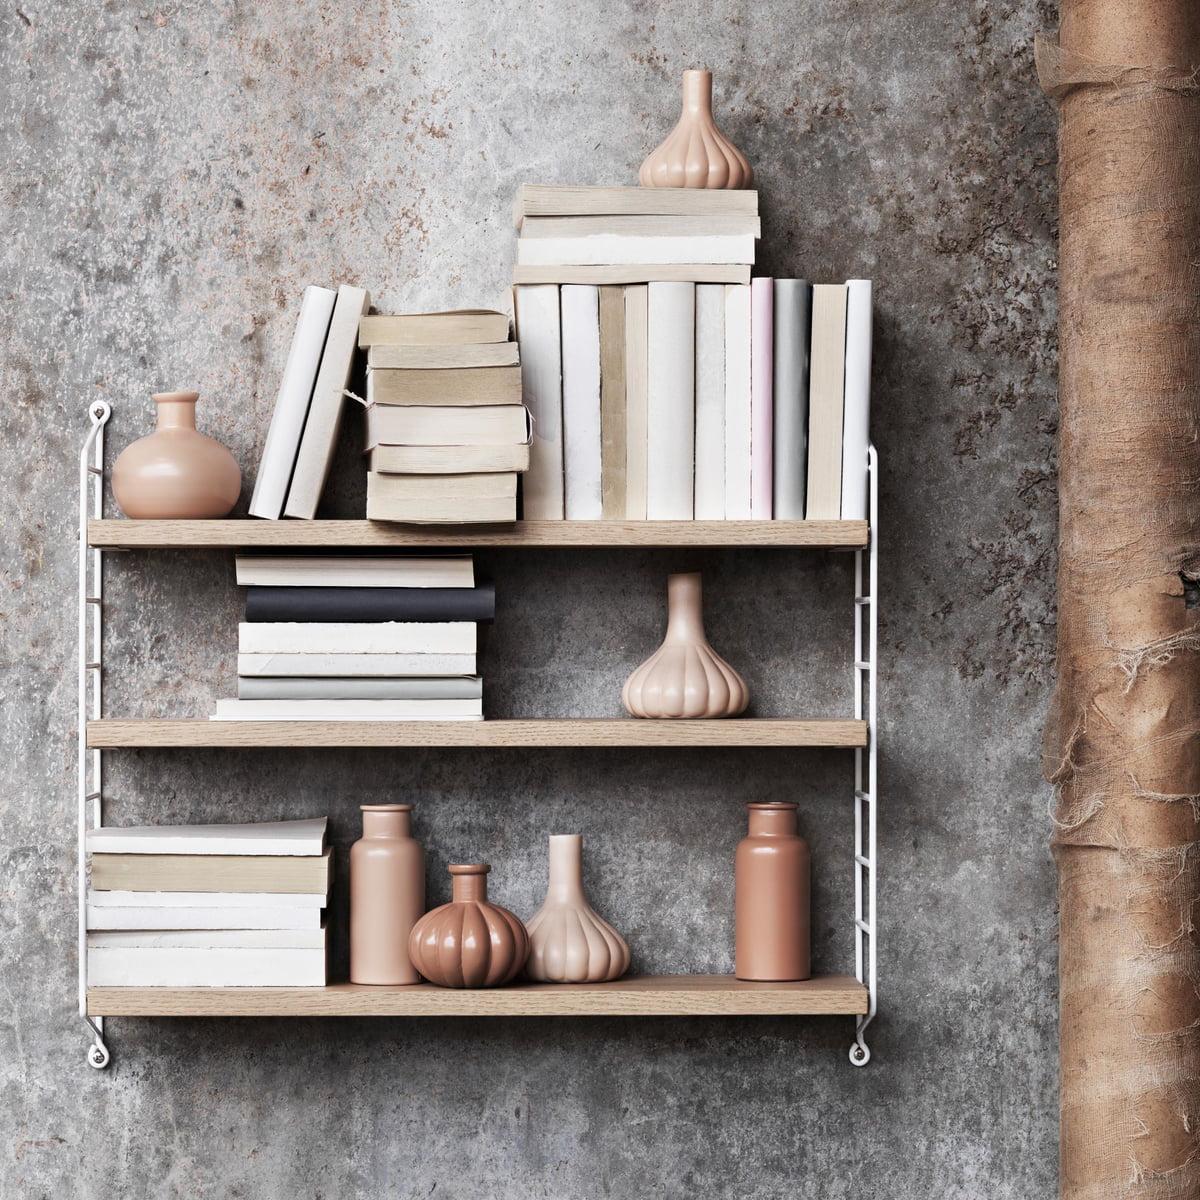 GroBartig String   Pocket Wall Shelf